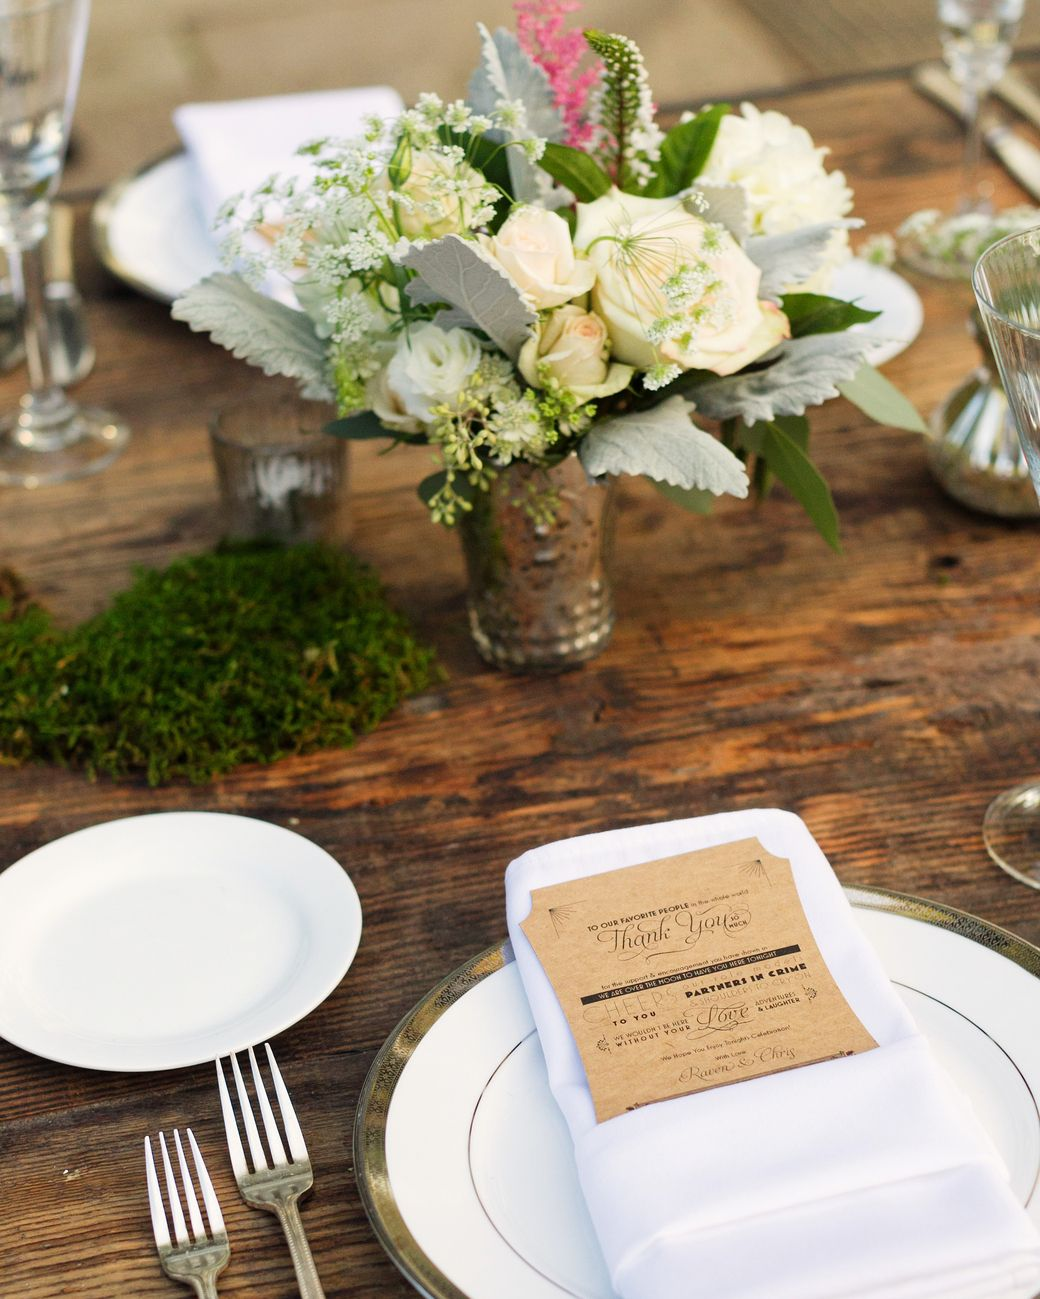 13 Dreamy Garden Wedding Ideas | Martha stewart weddings, Garden ...